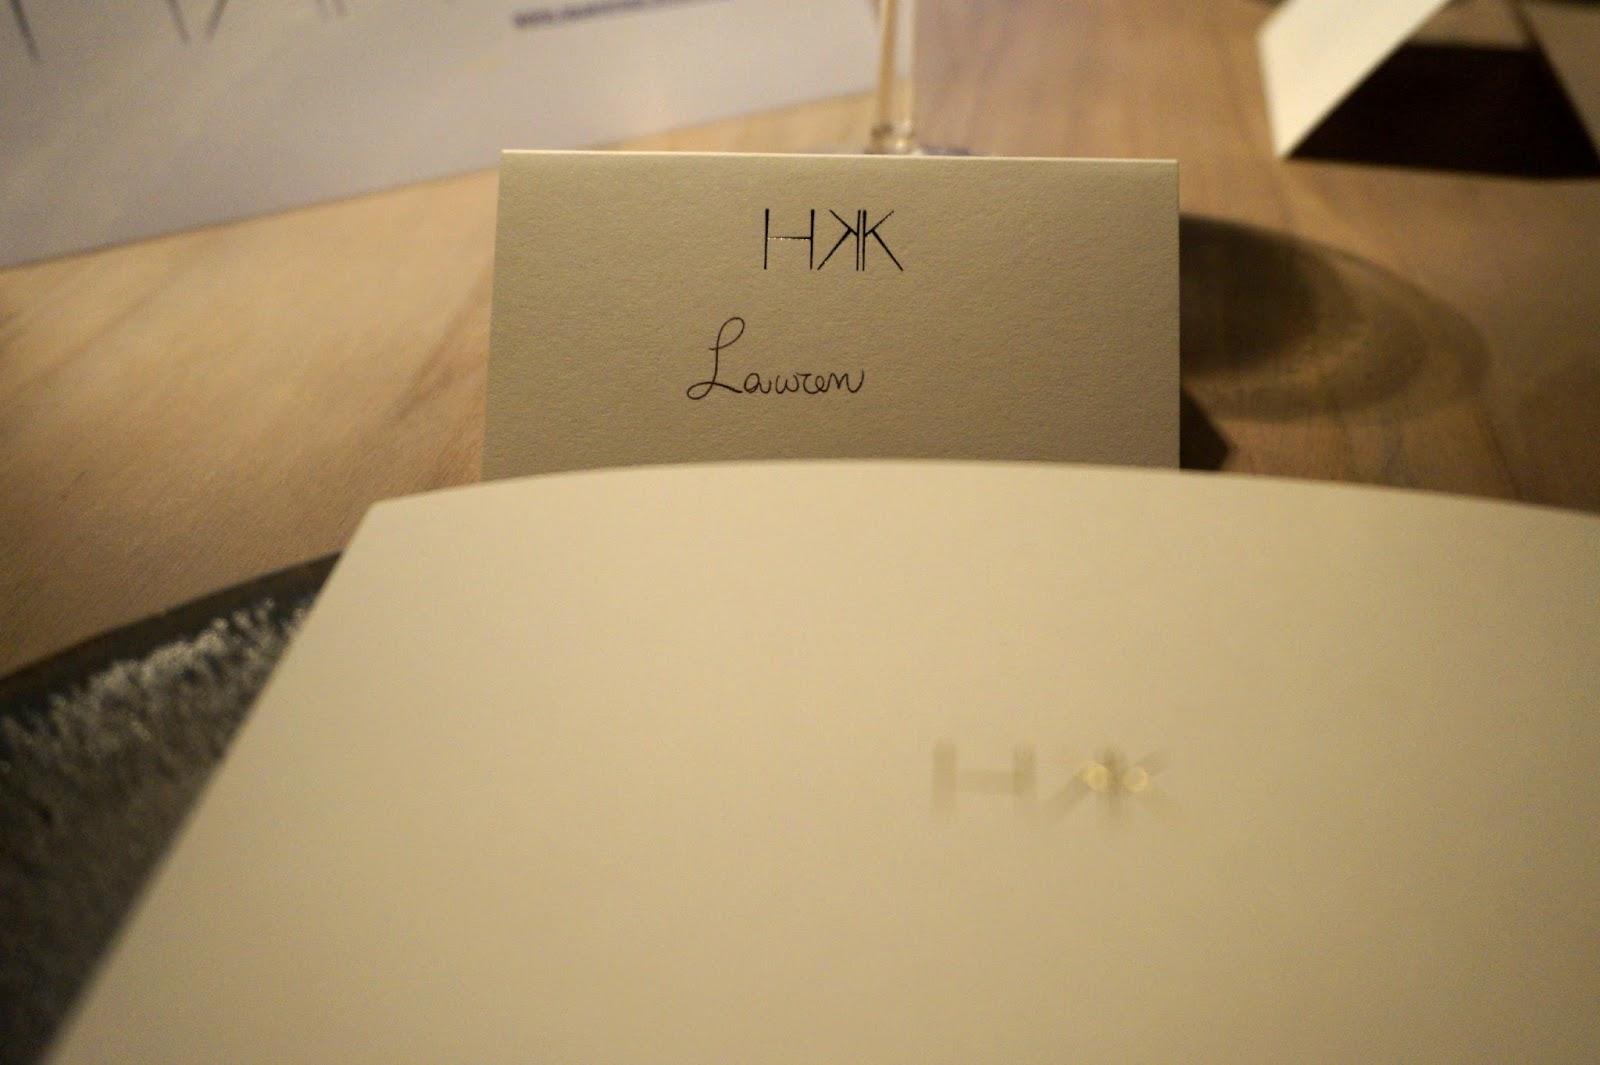 HKK tasting menu